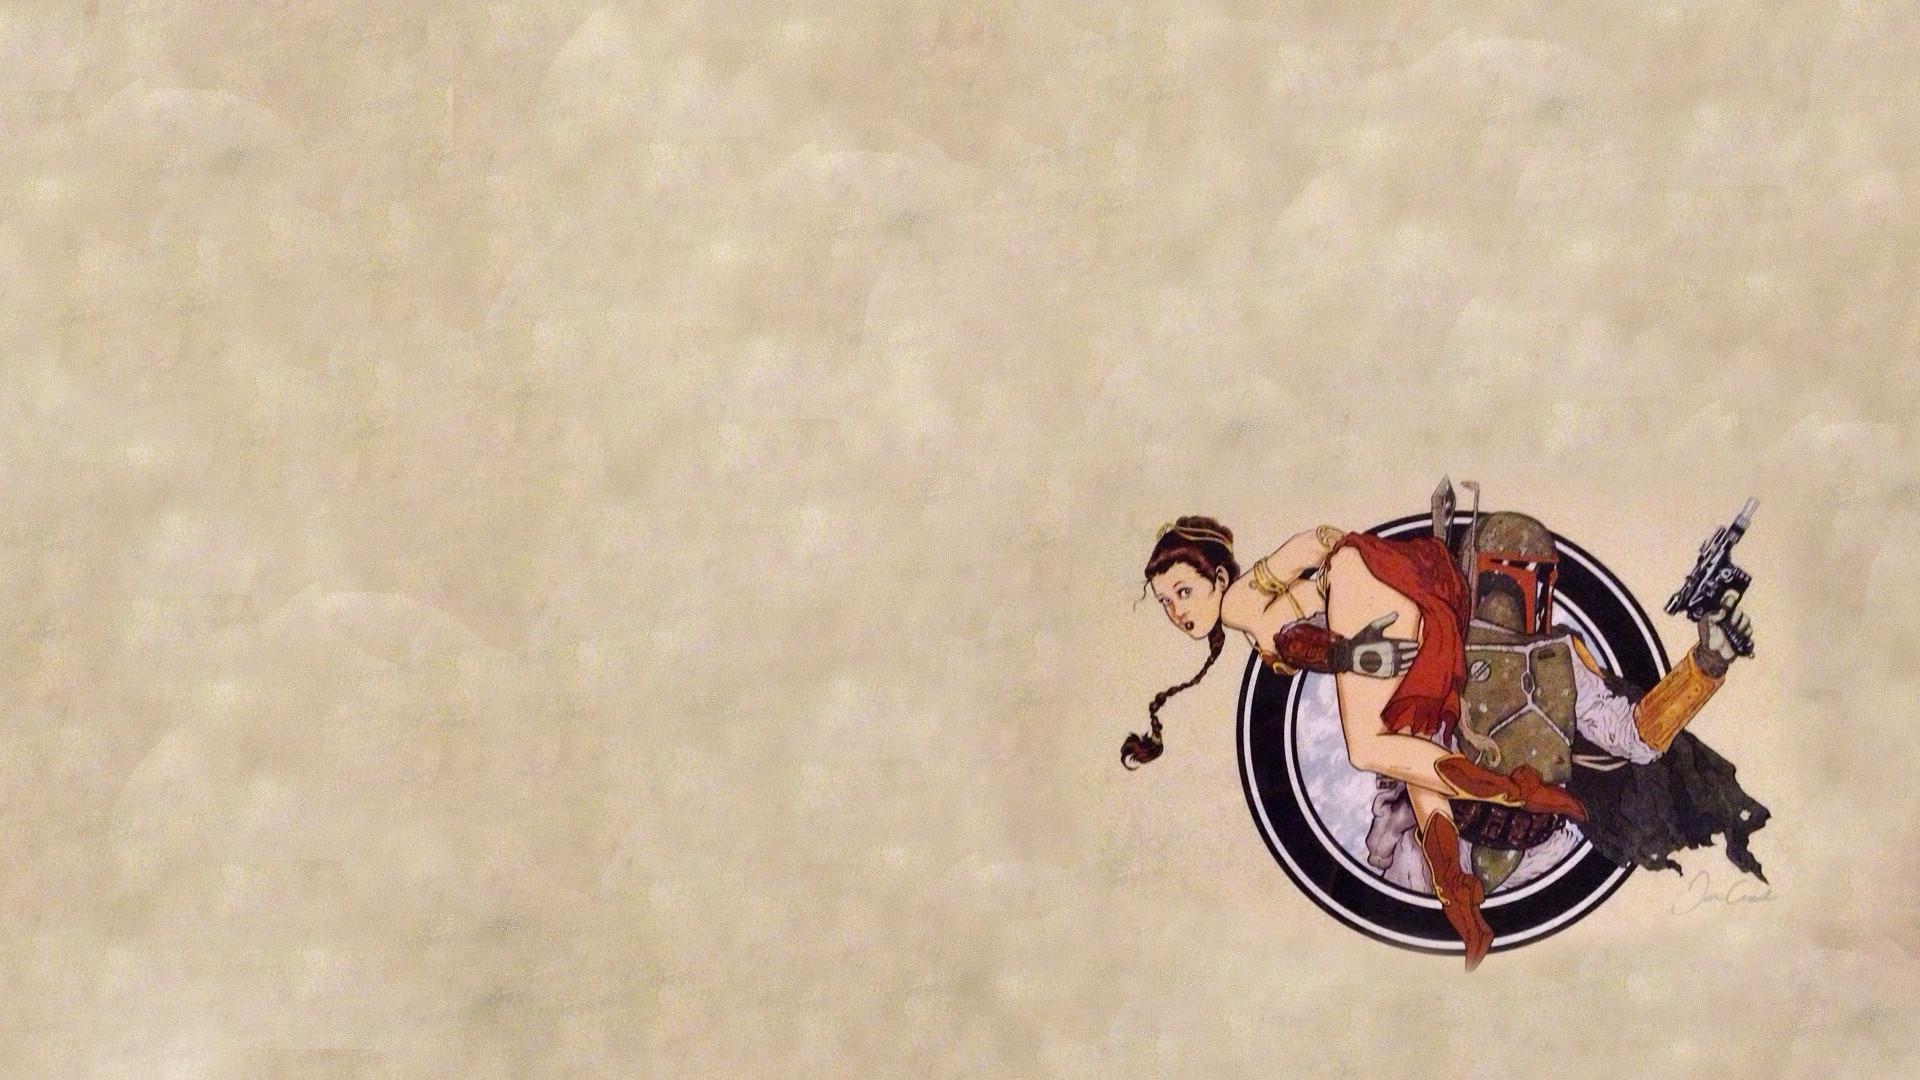 Sci Fi – Star Wars Boba Fett Princess Leia Wallpaper